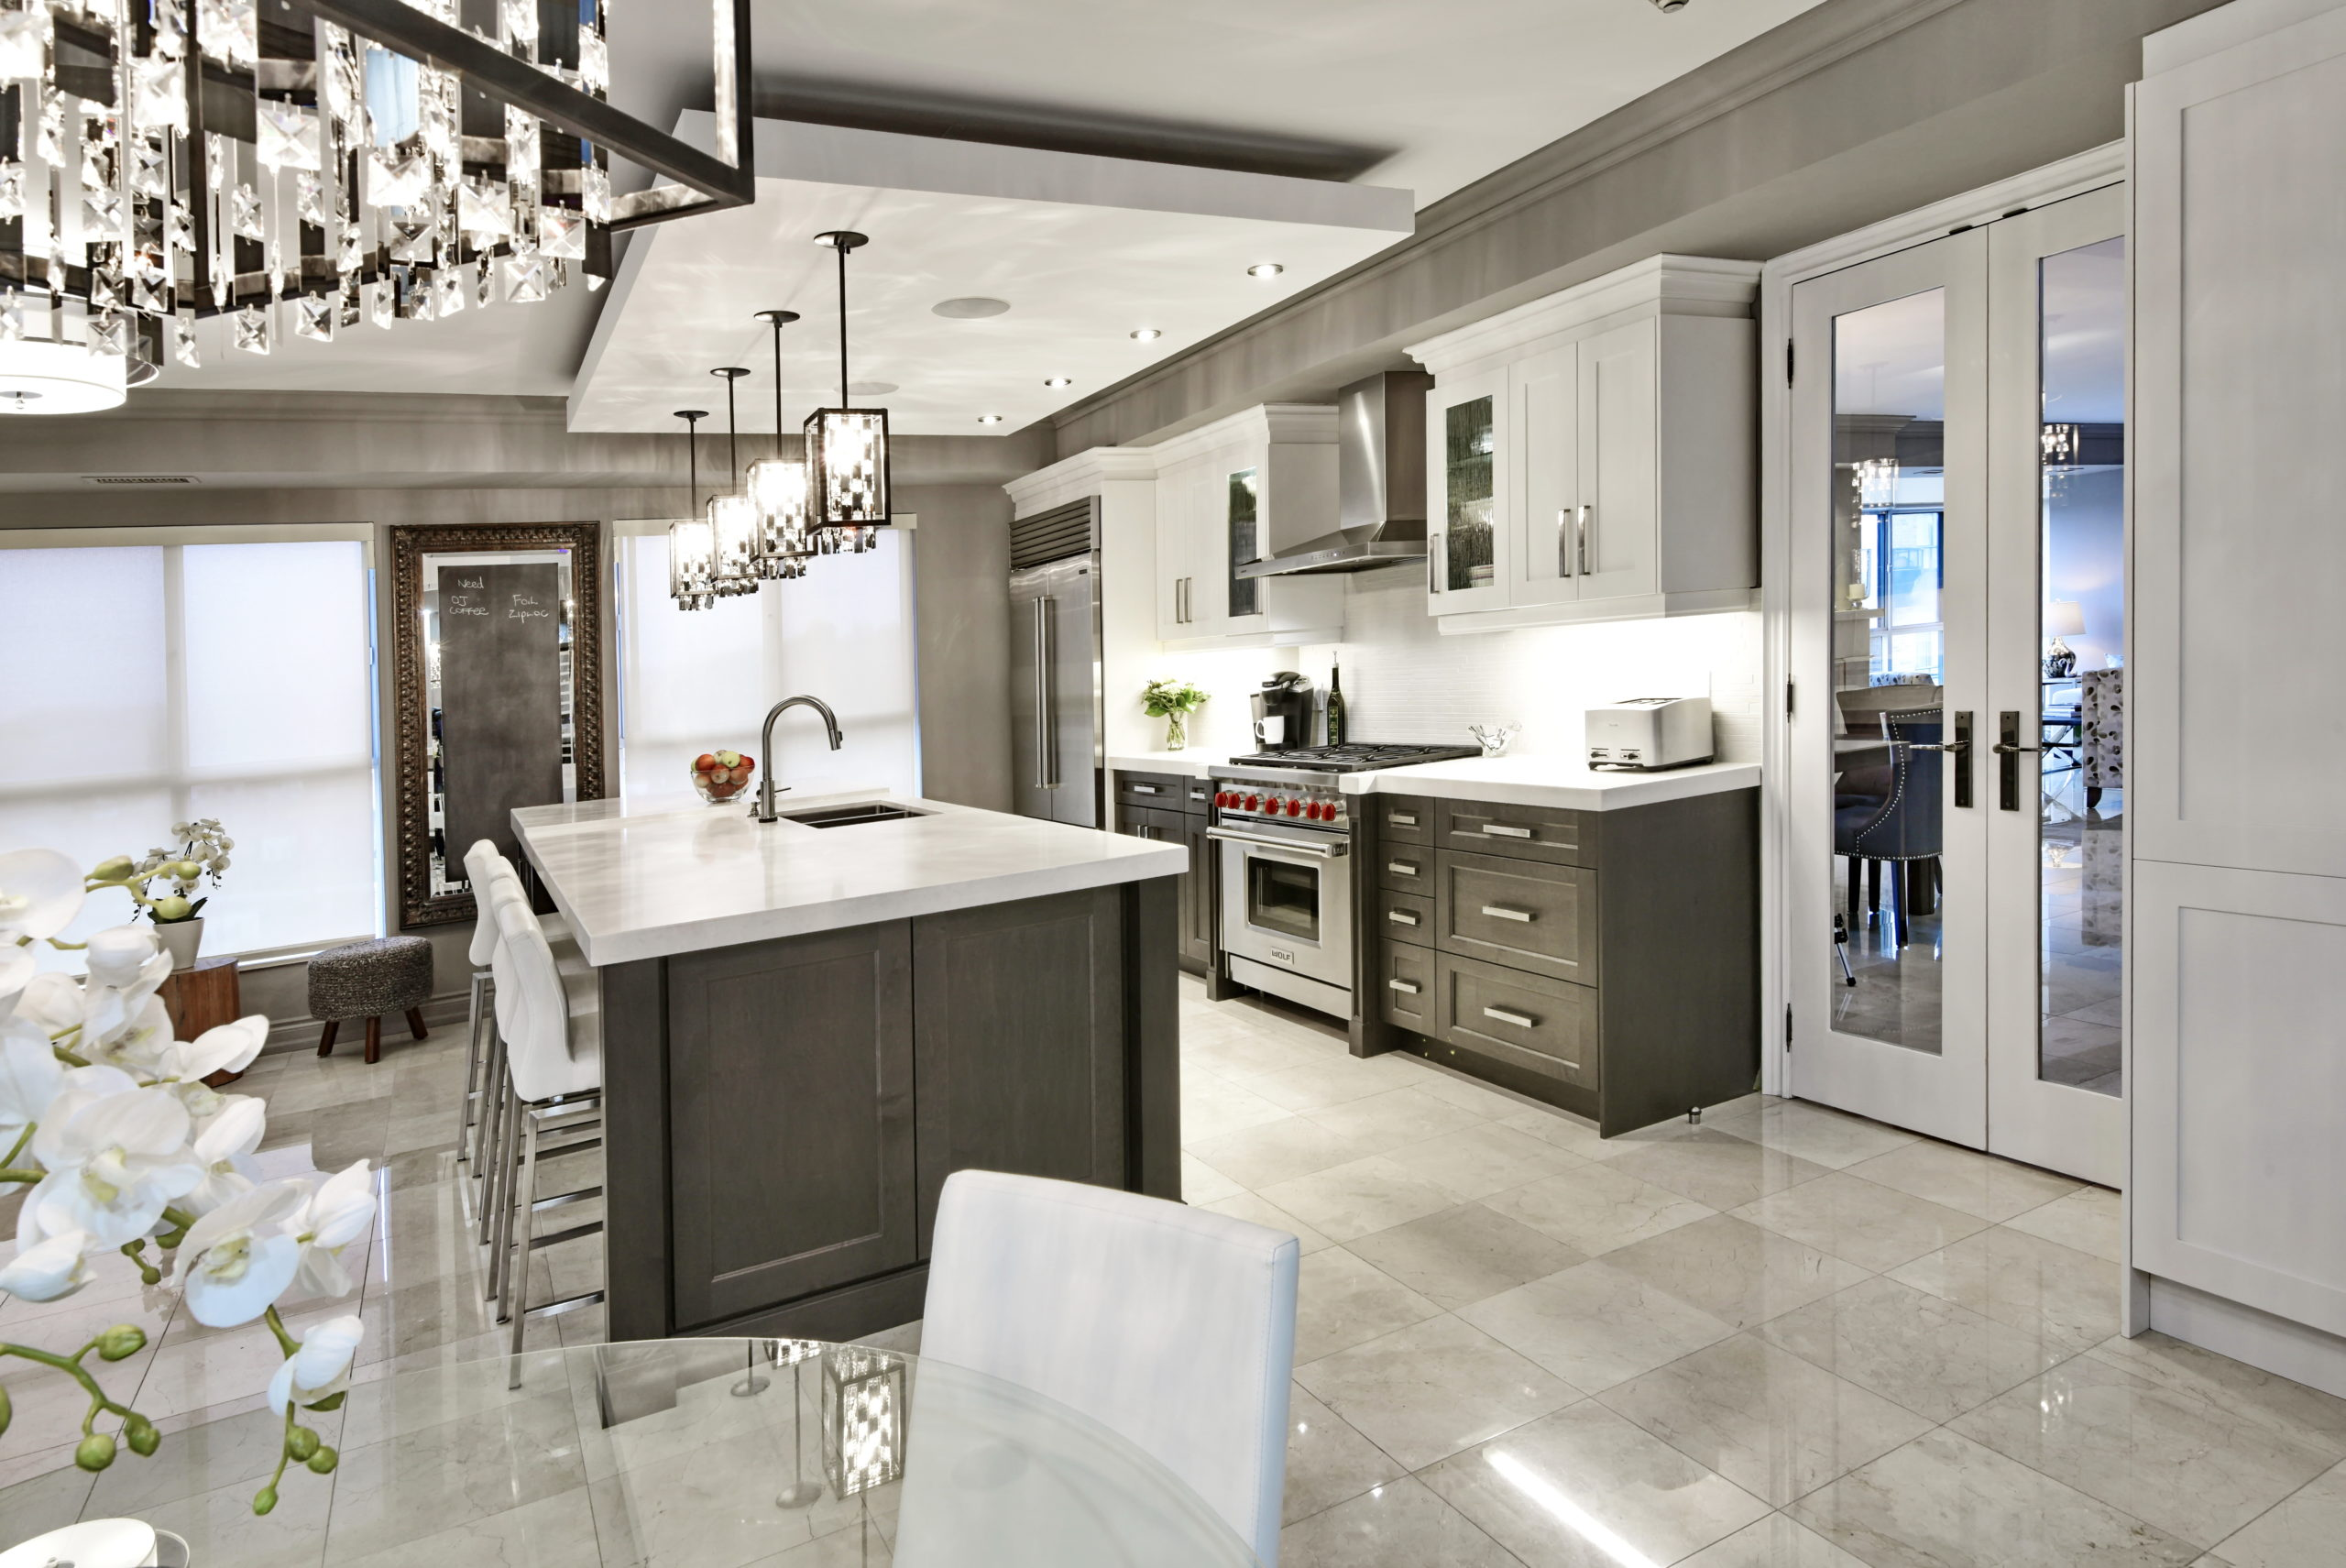 _DSC9995A DIANA-1508009   Selba Kitchens & Baths is a ...